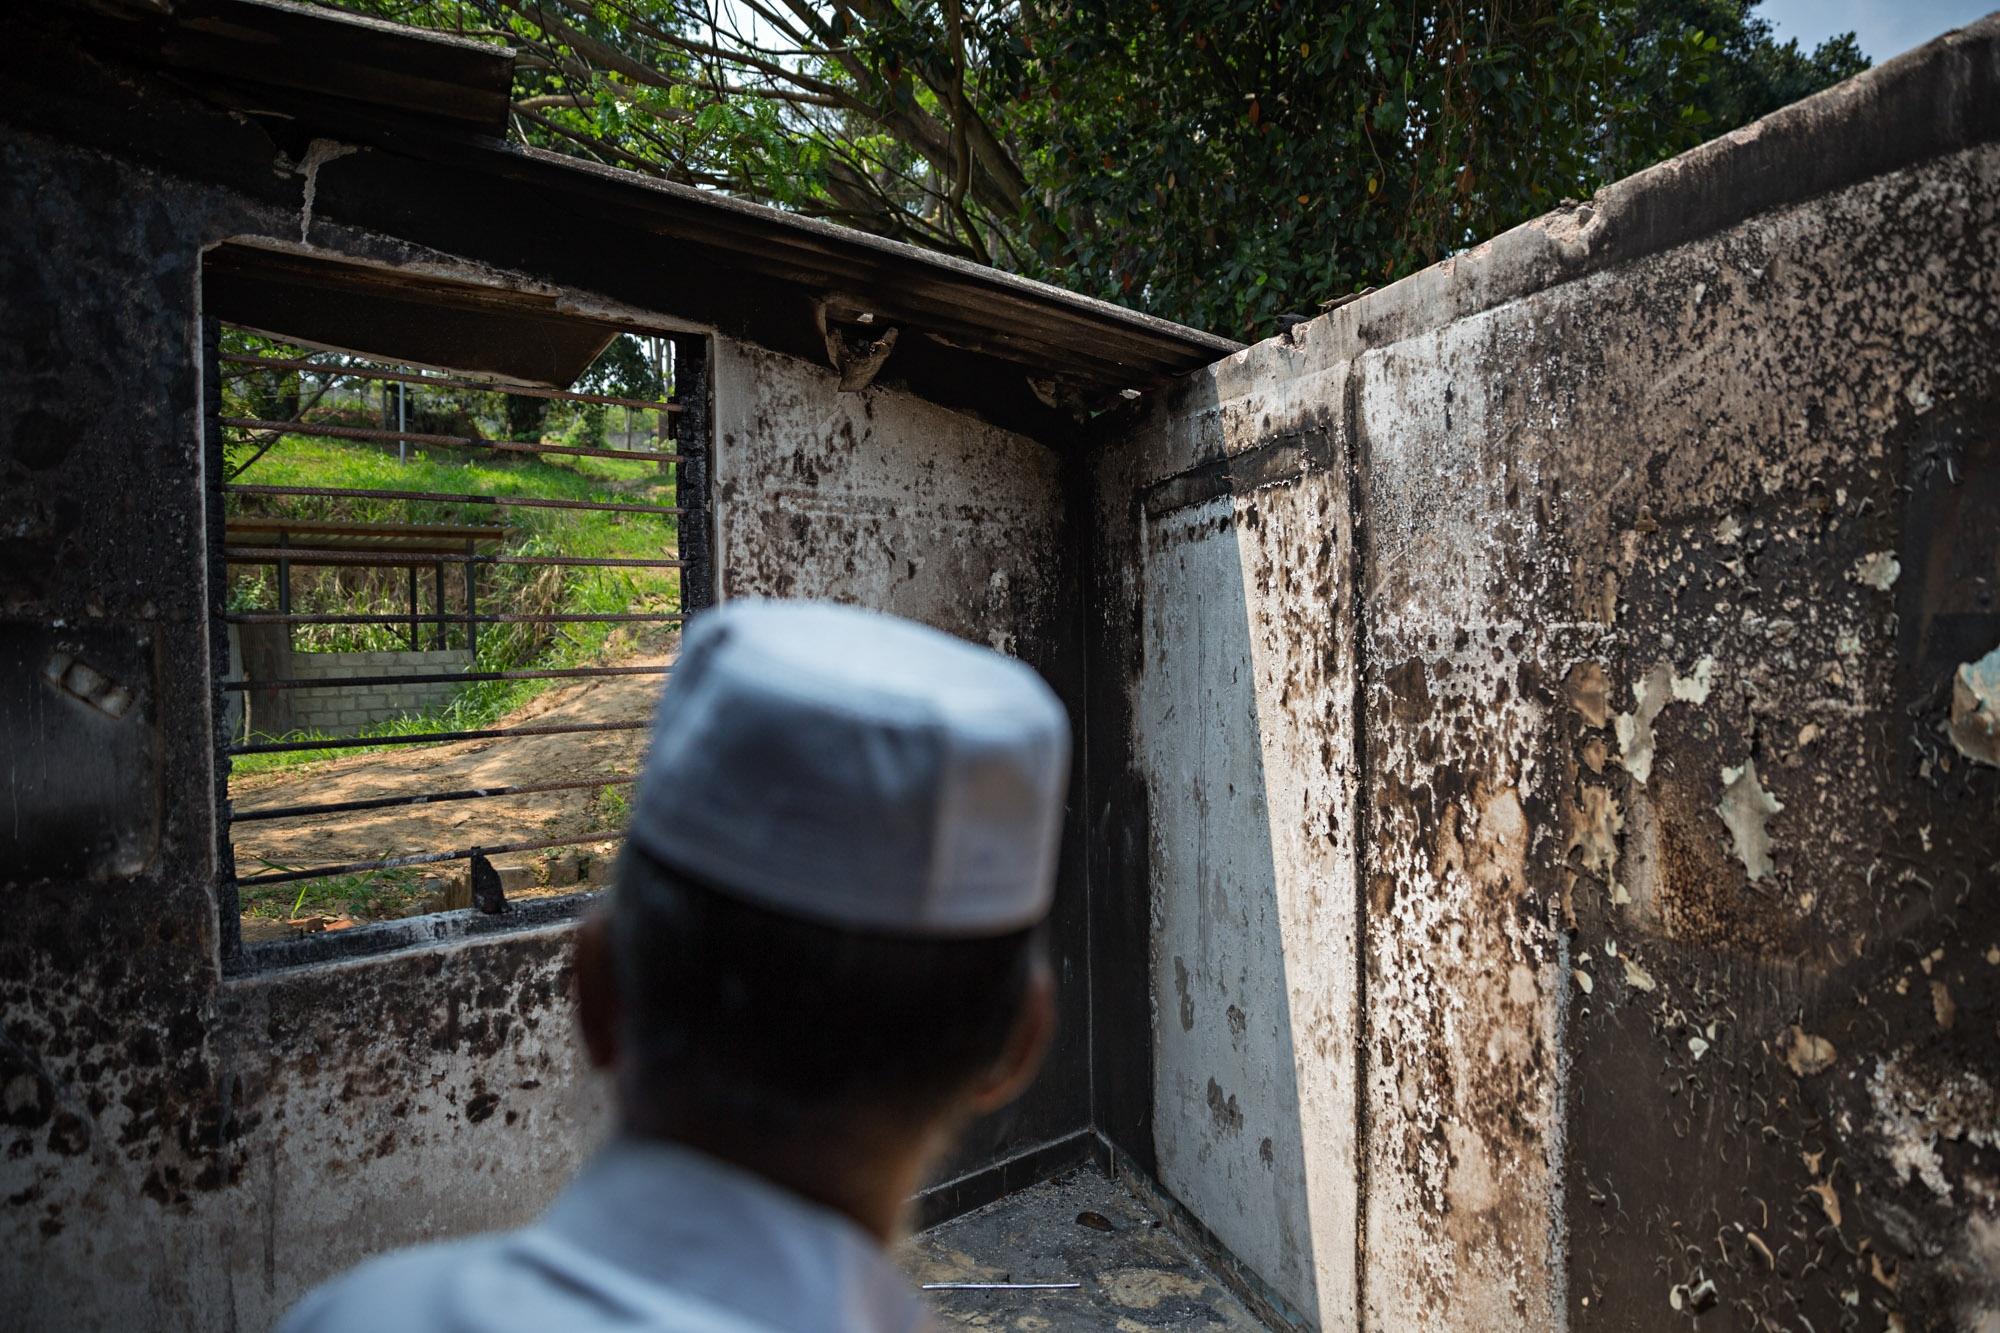 A man looks out of a burned out window at Masjidul Lafir Jummah Mosque in Digana, Sri Lanka.